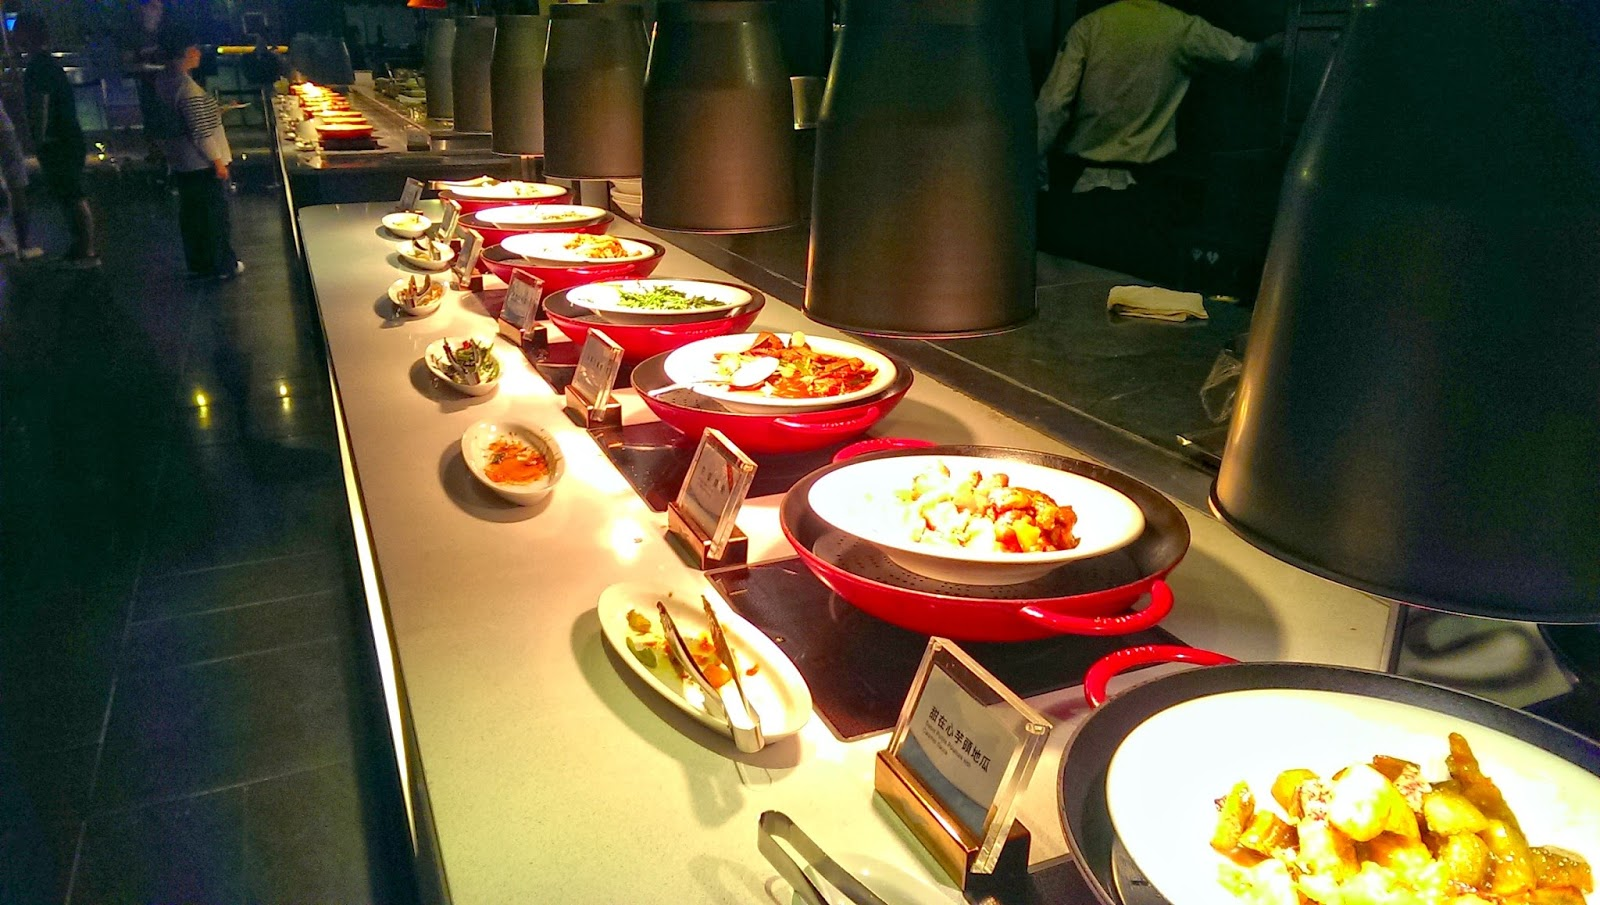 2015 07 01%2B20.07.41 - [食記] 台北京站 - 饗食天堂,有生魚片吃到飽的高級自助餐廳!